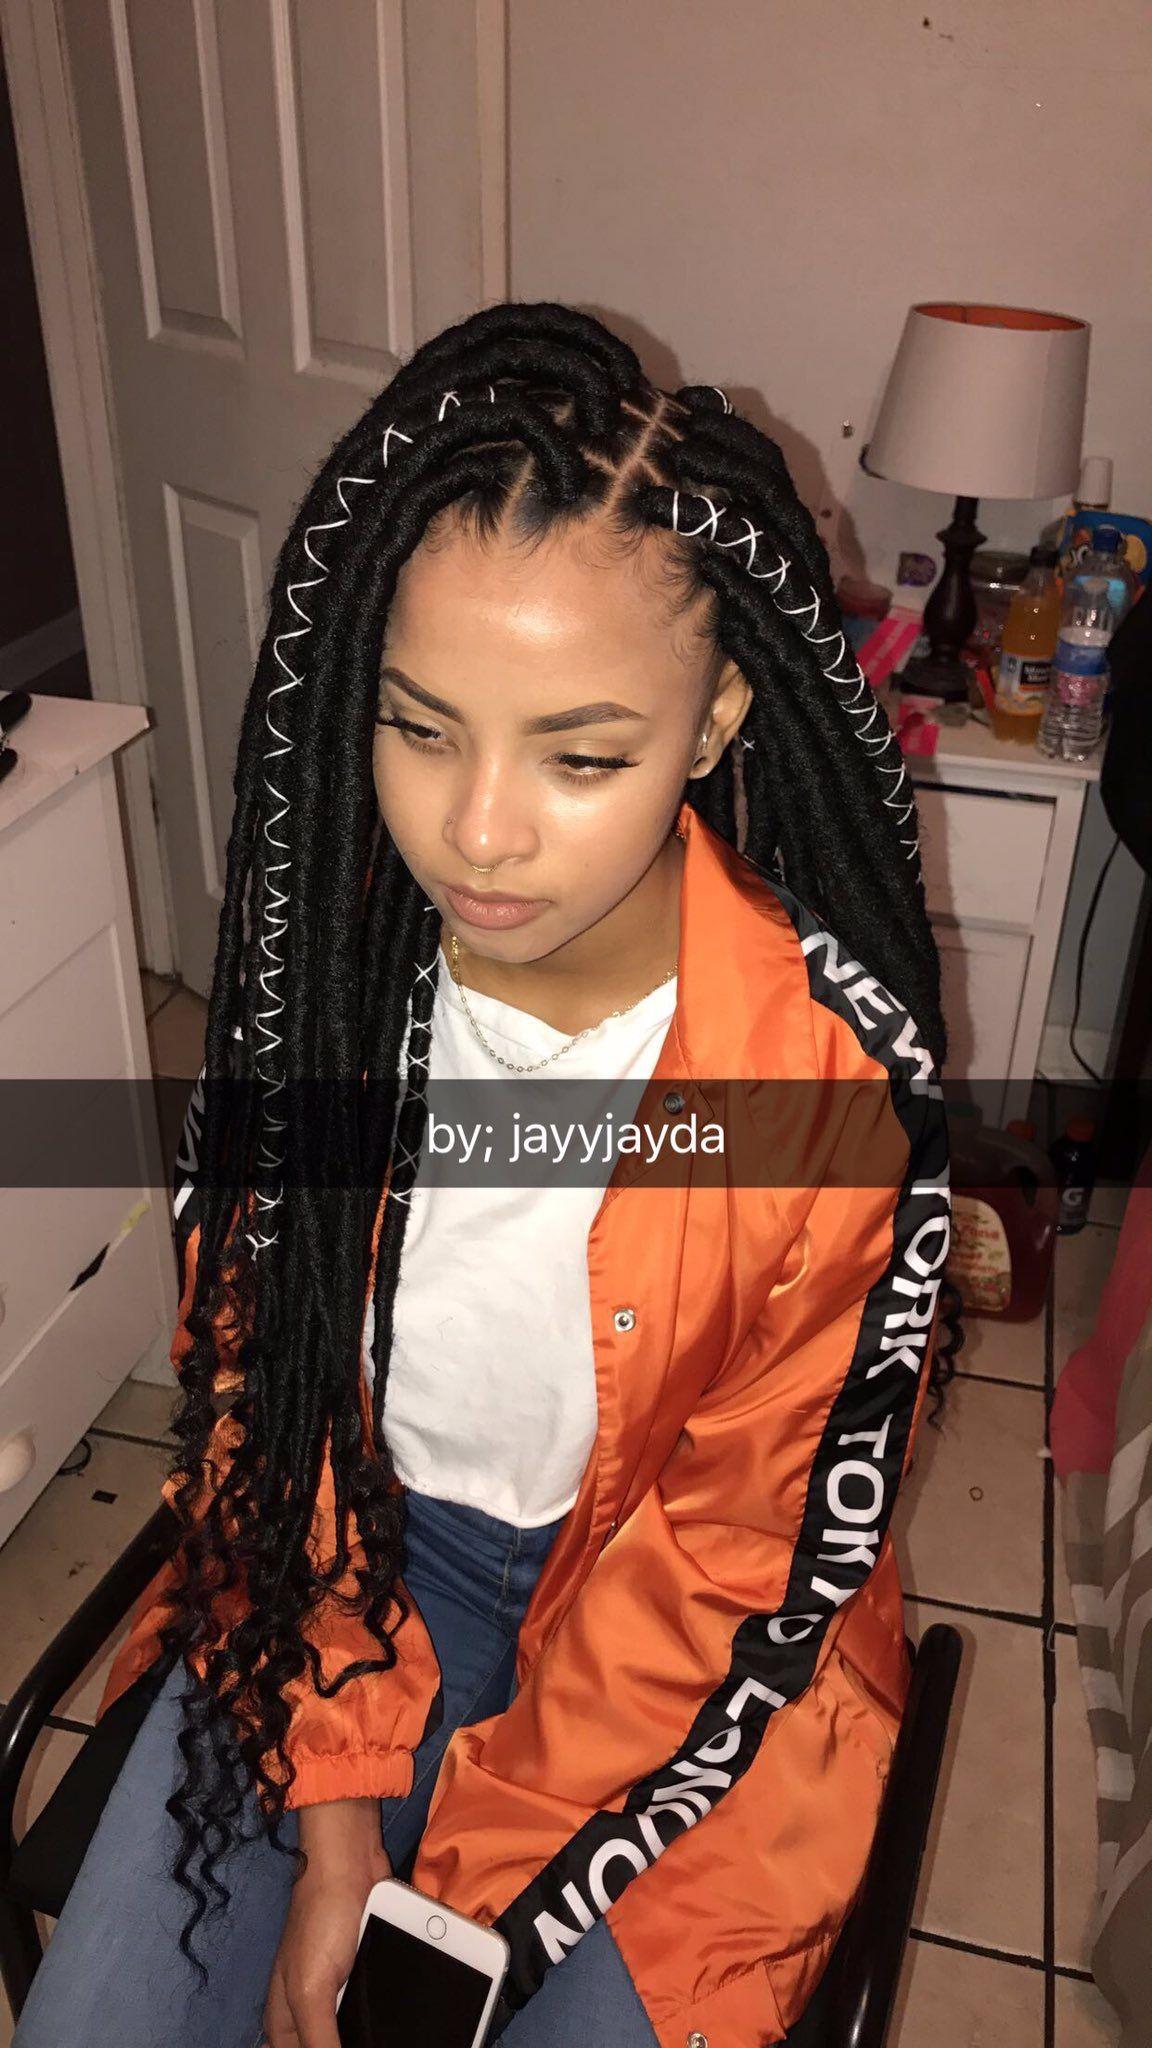 Braided Hairstyles for Little Girls hairstyleforblackwomen.net 286